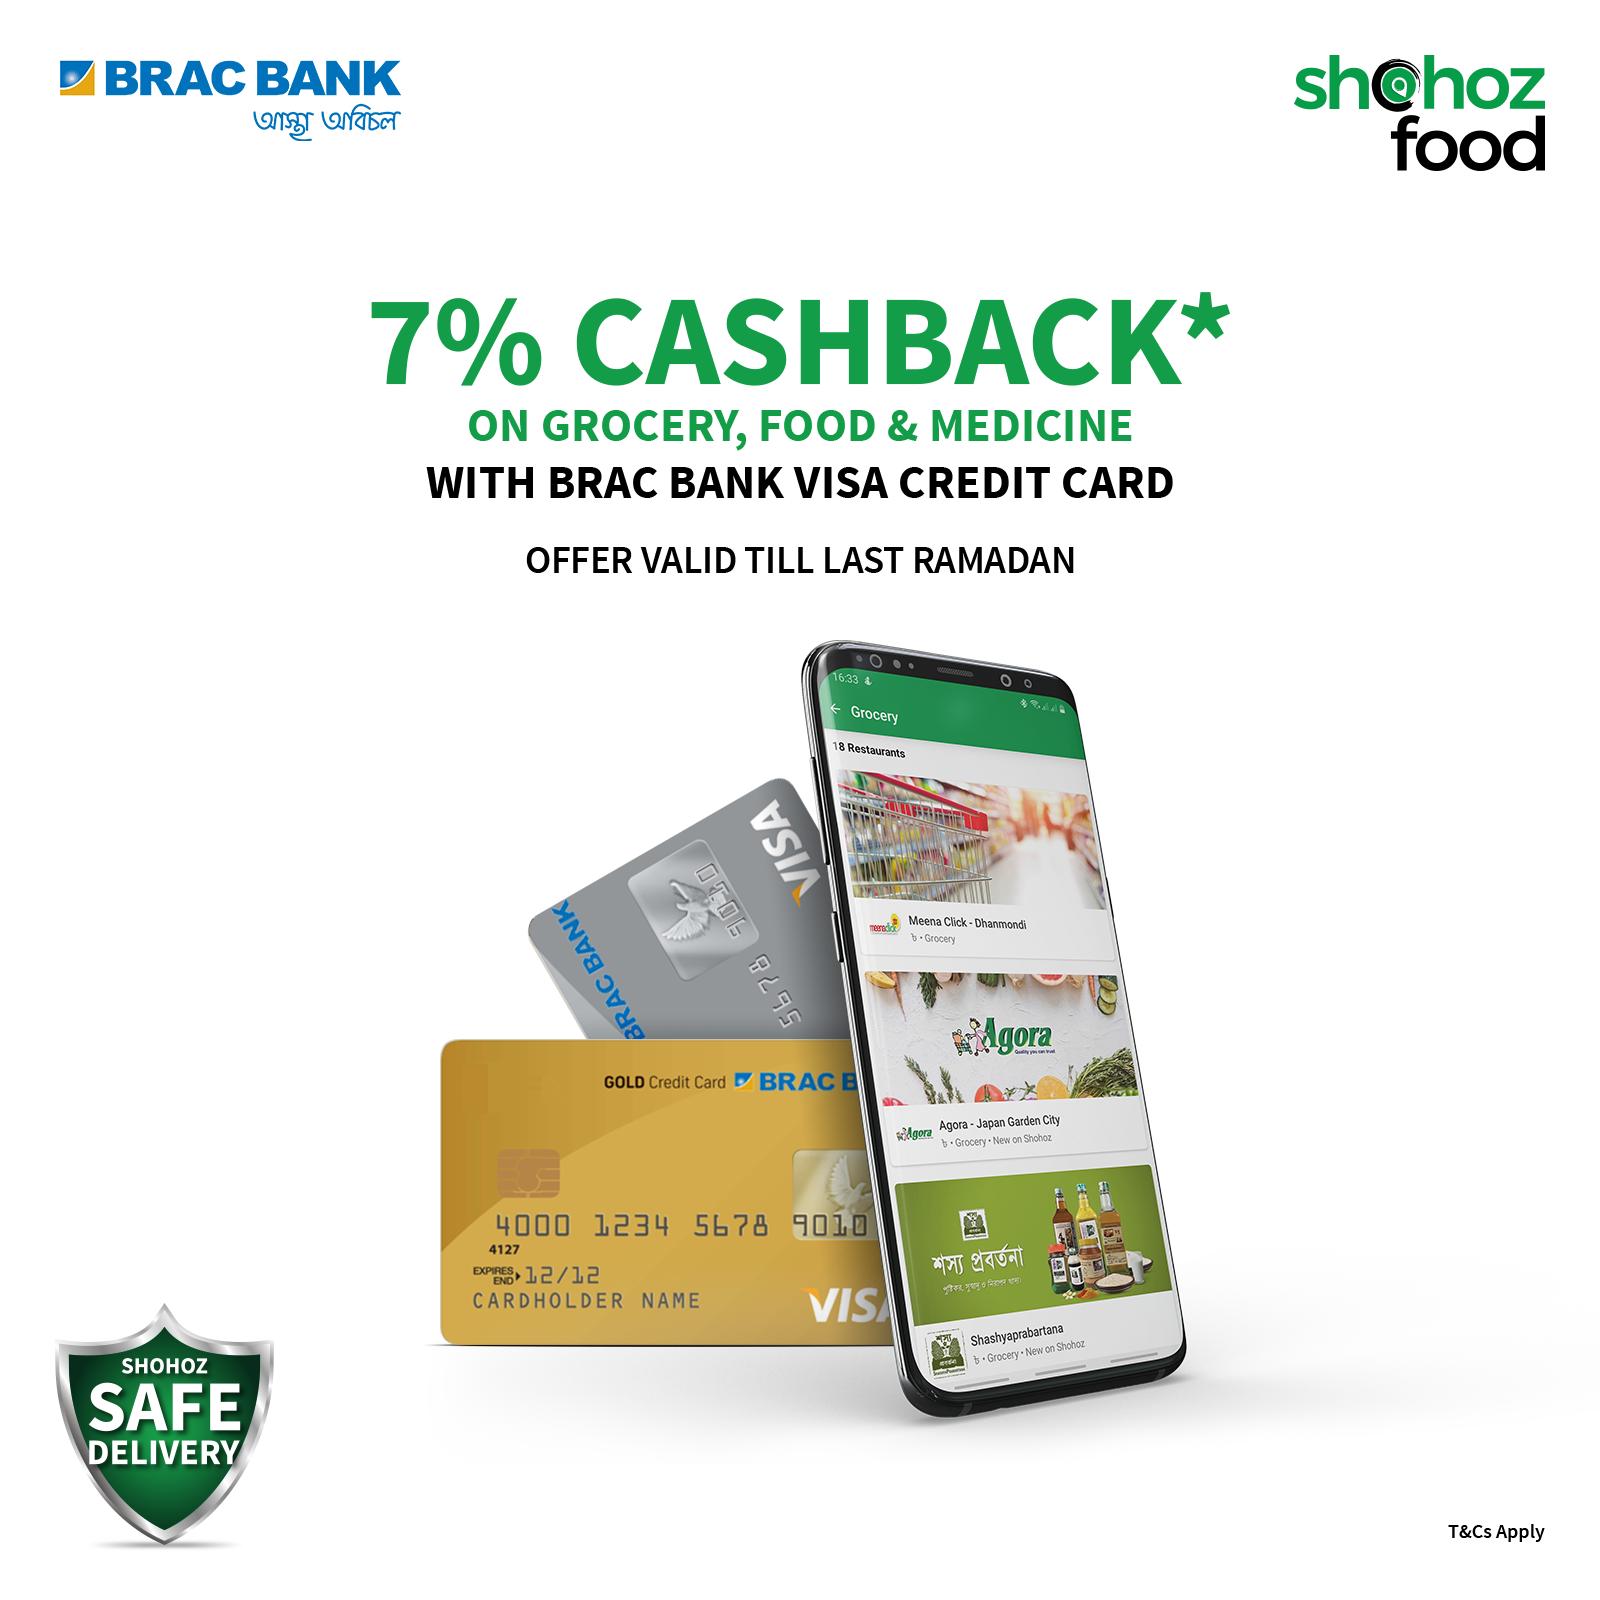 brac bank offer